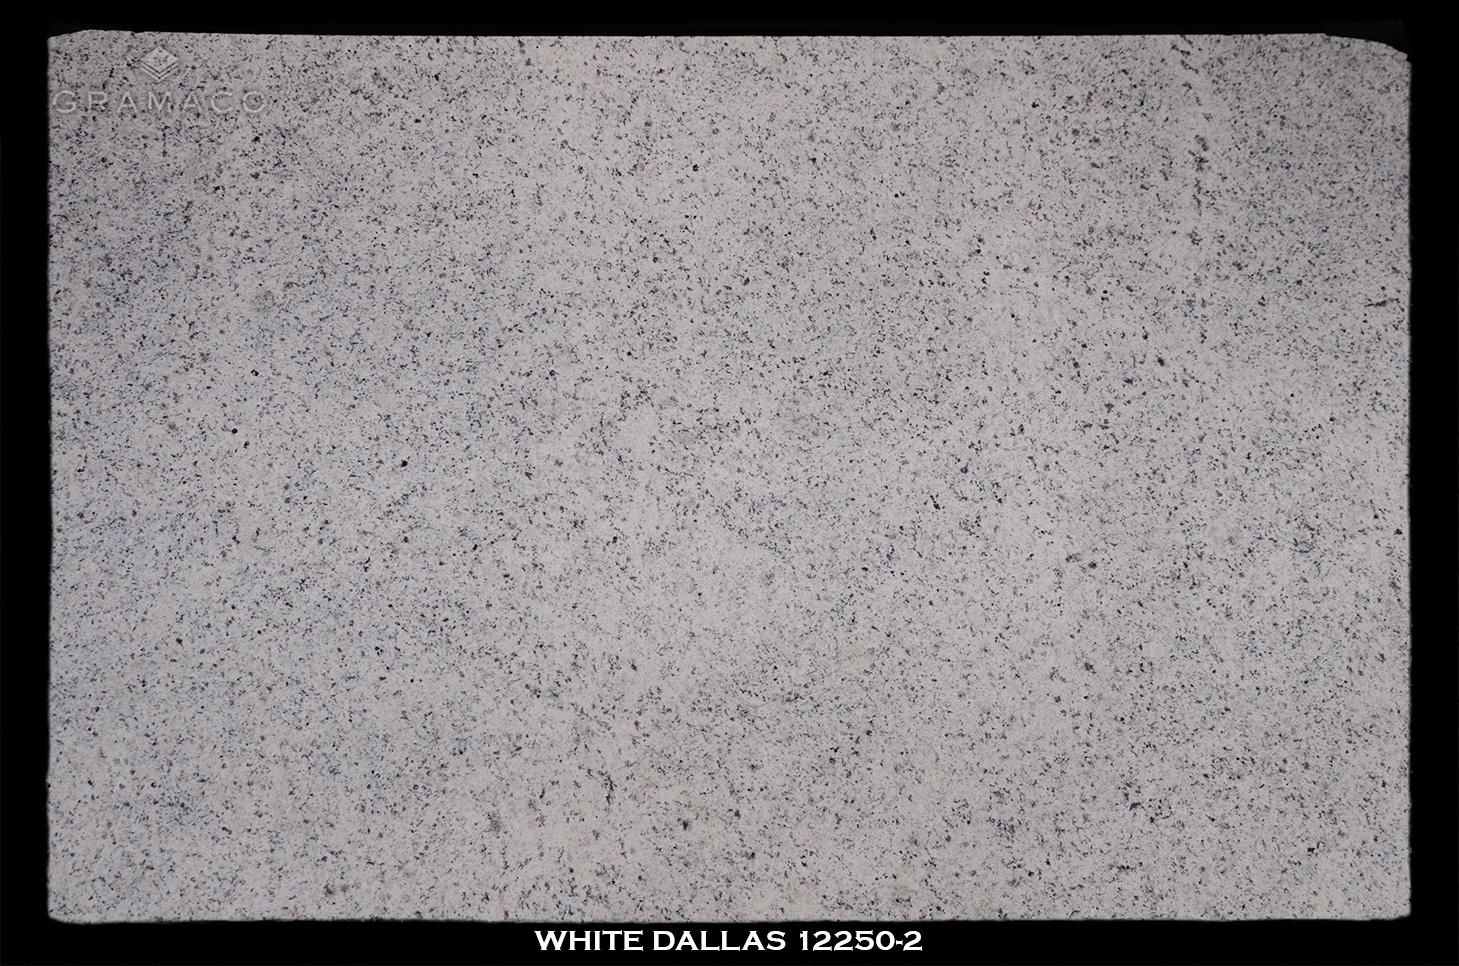 WHITE-DALLAS-12250-2--FULL-SLAB-BLACK